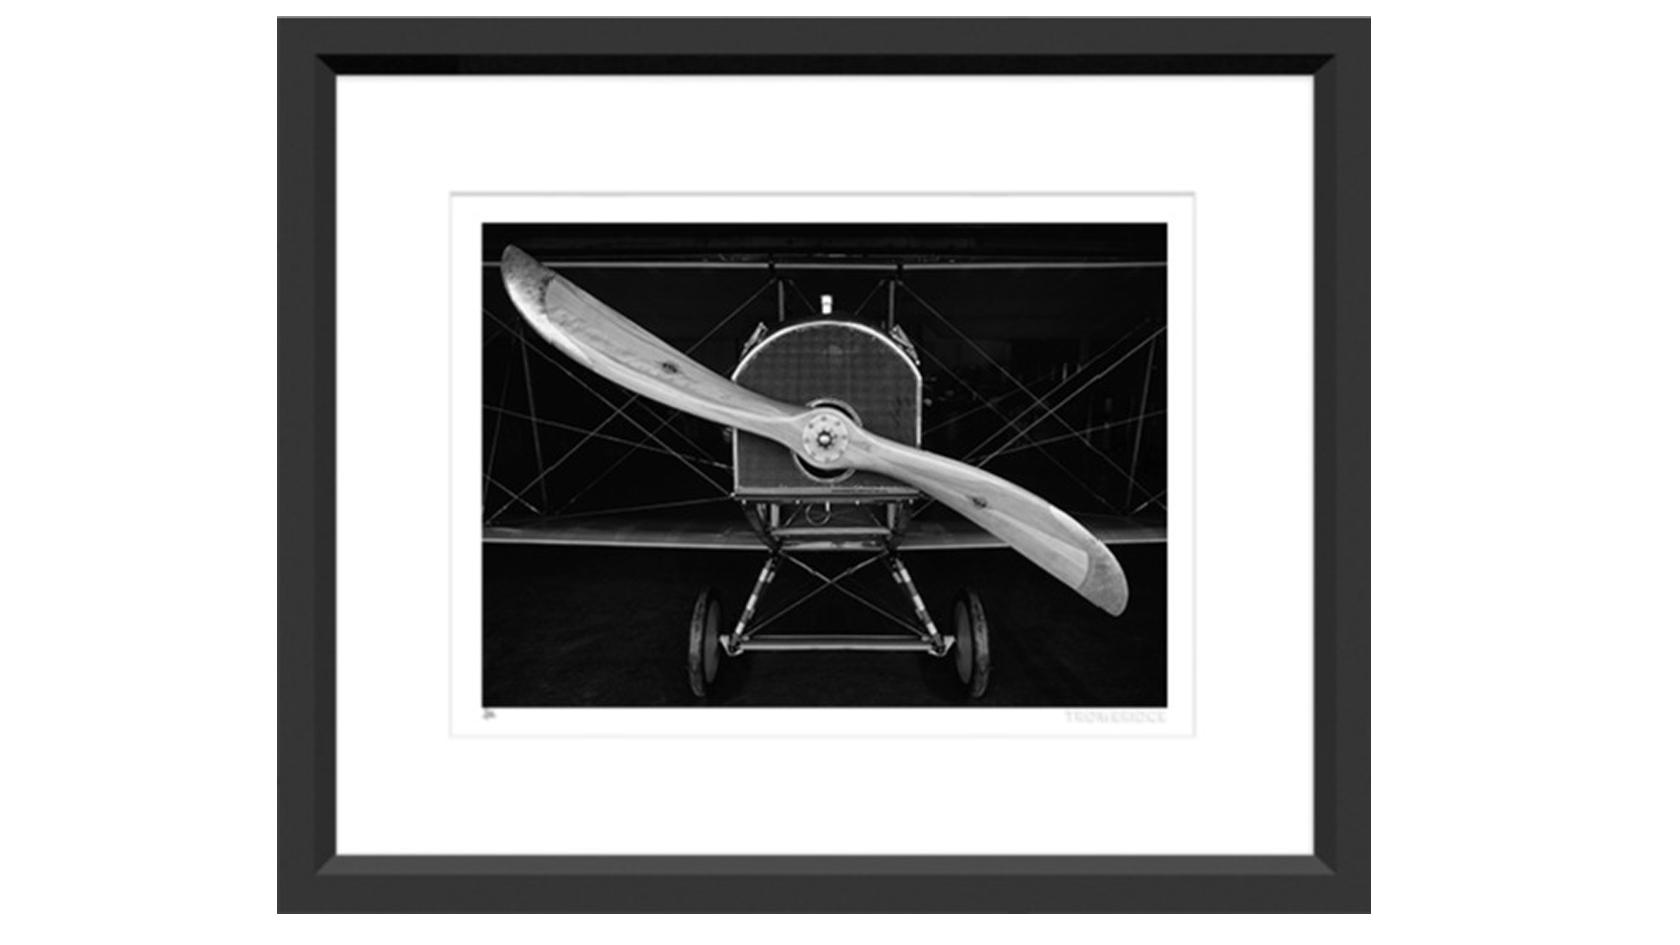 biplane-propeller